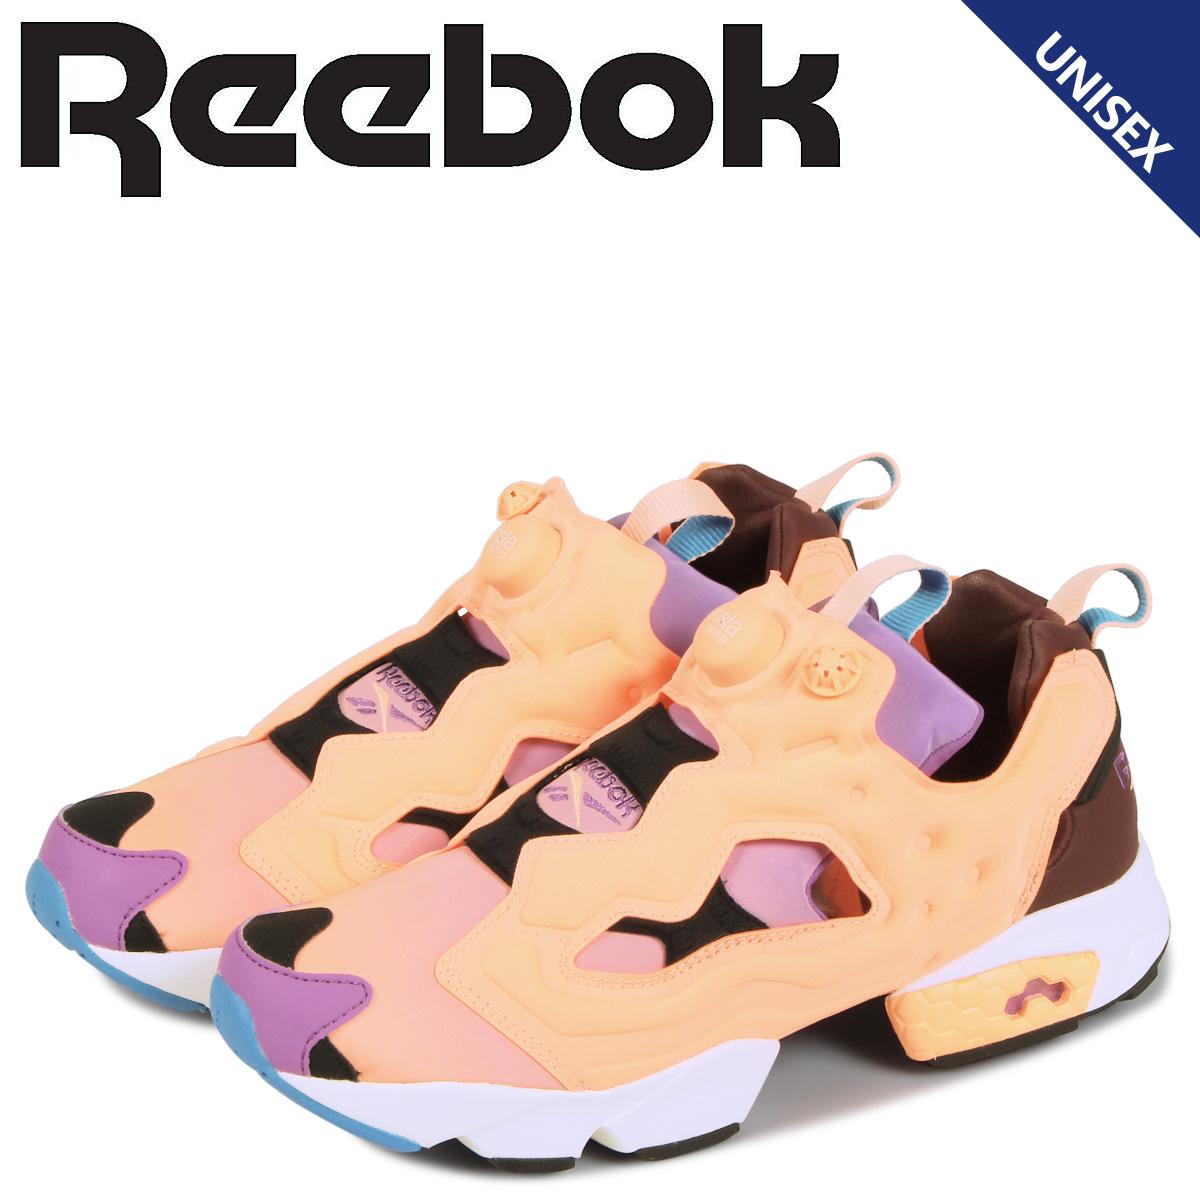 Reebok リーボック インスタ ポンプフューリー スニーカー メンズ レディース INSTAPUMP FURY OG RI ピンク DV7188